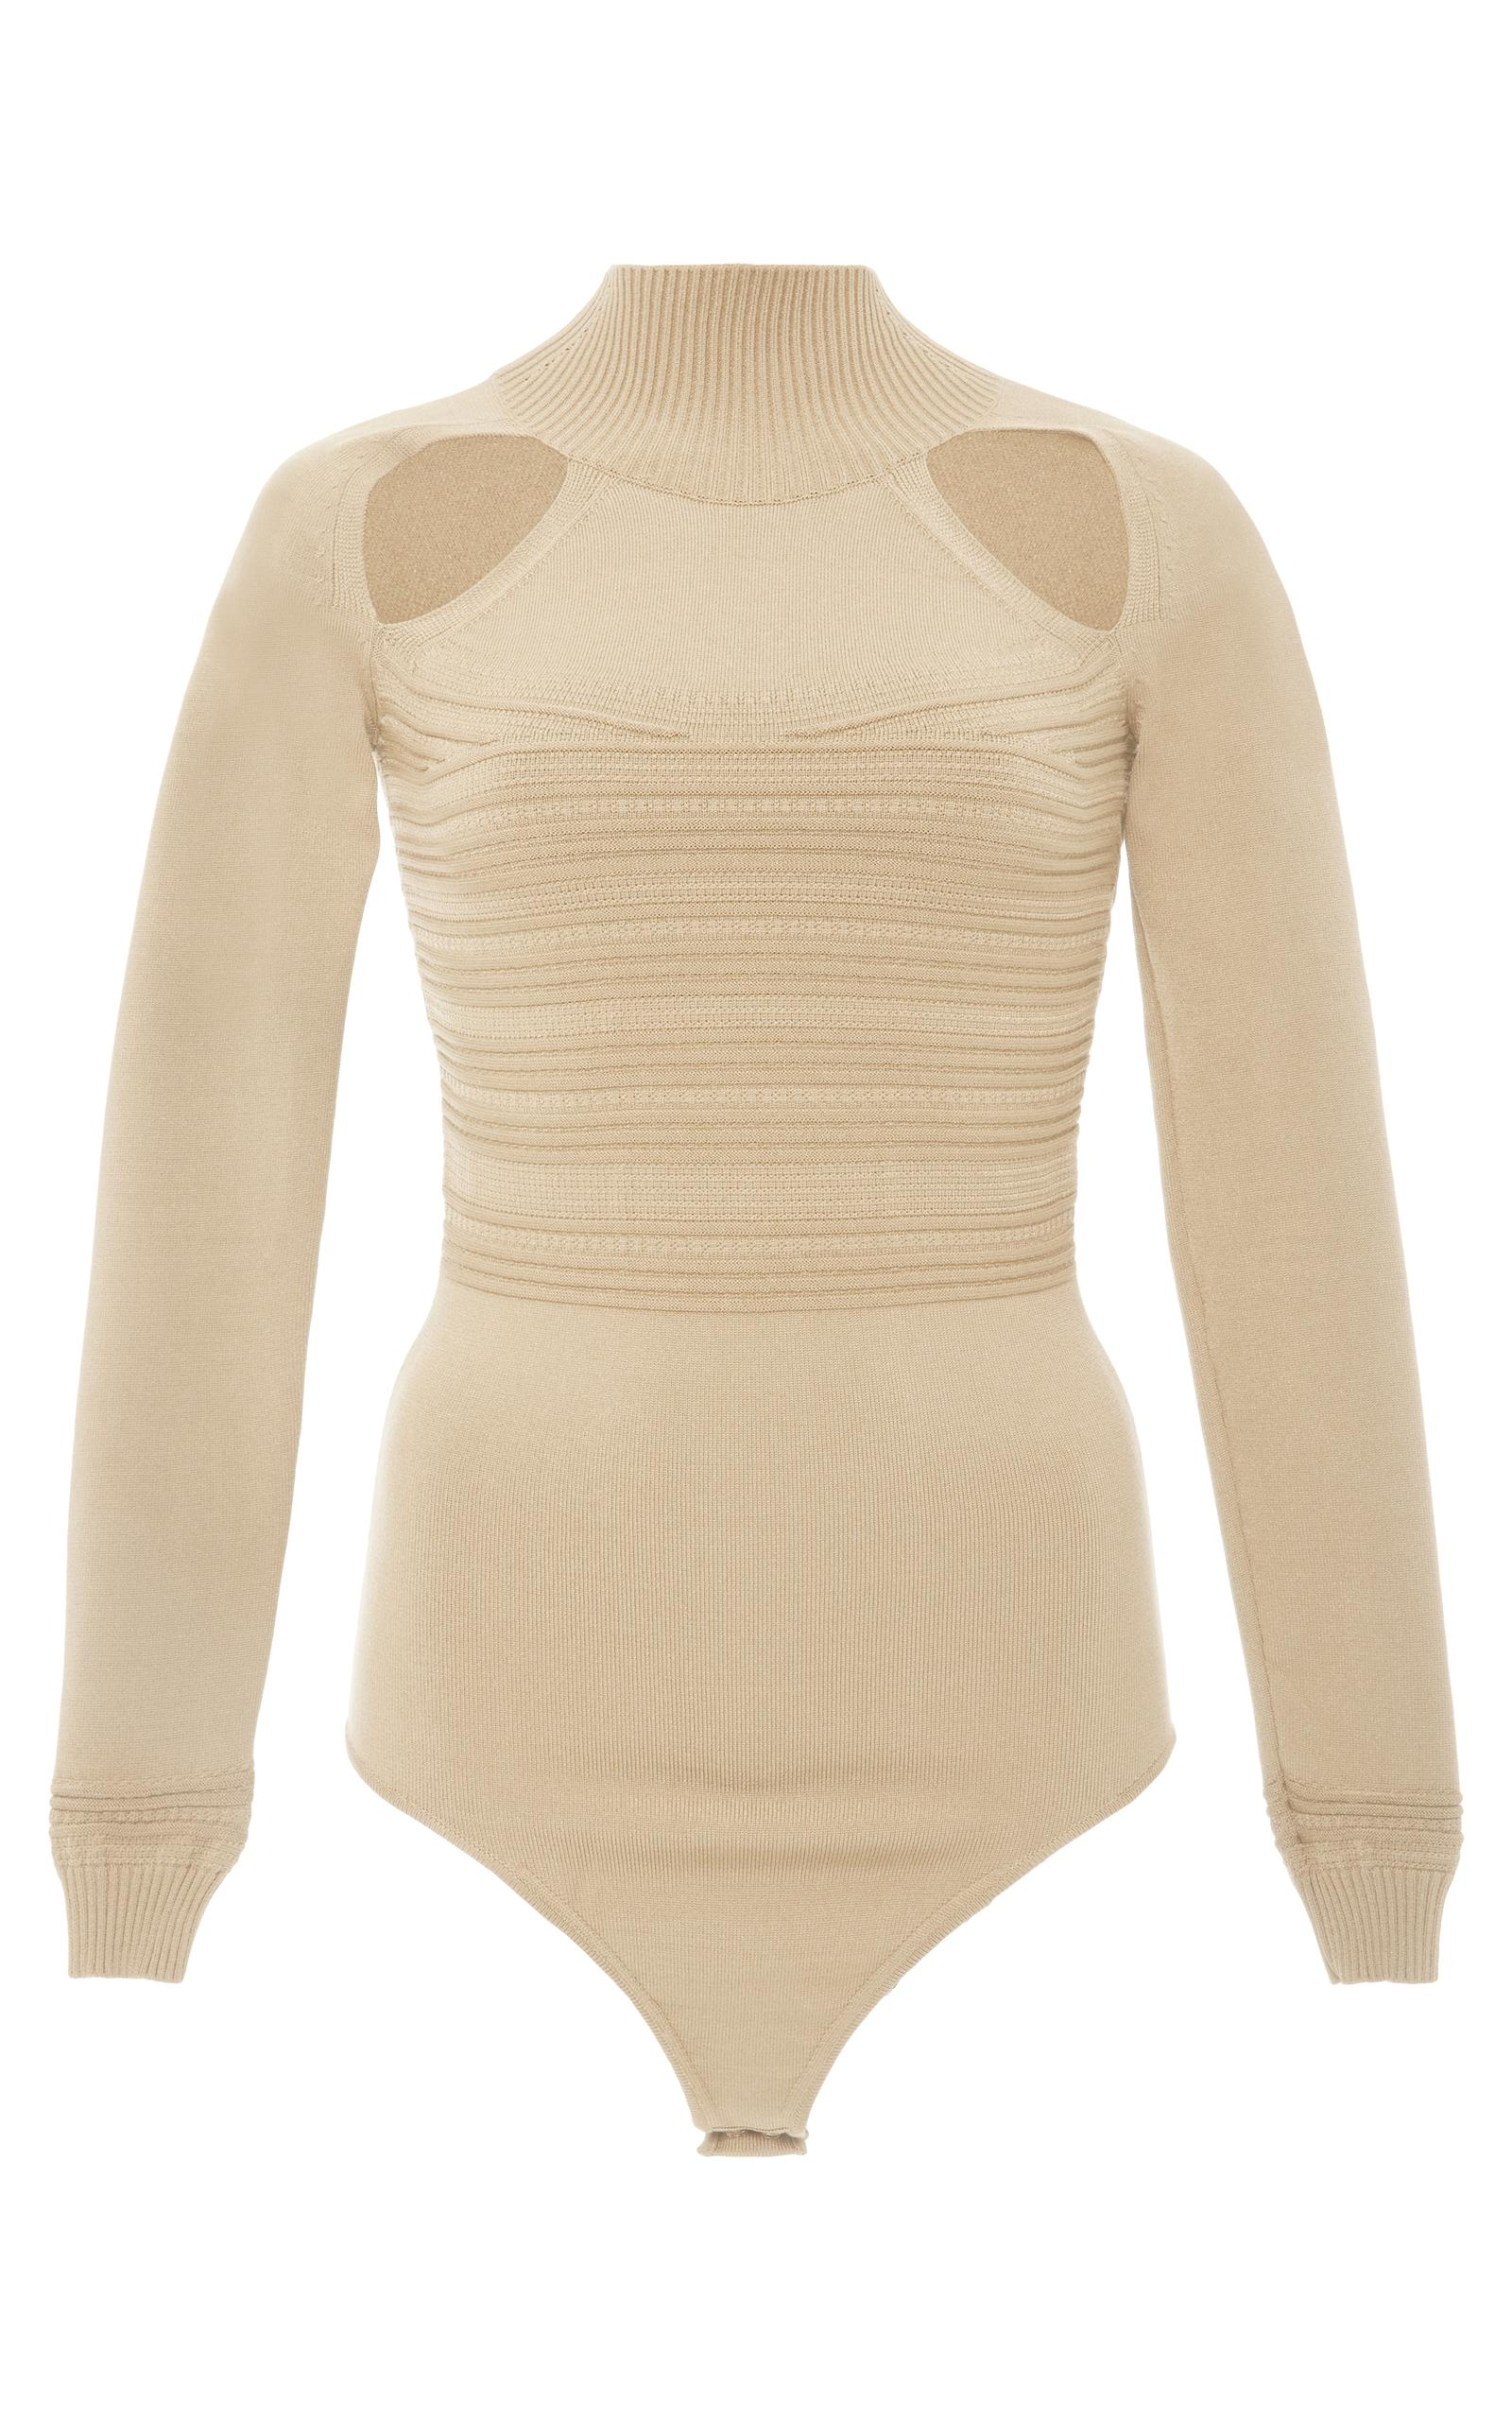 Cushnie Et Ochs Rayon Viscose Fiona Bodysuit In Neutral